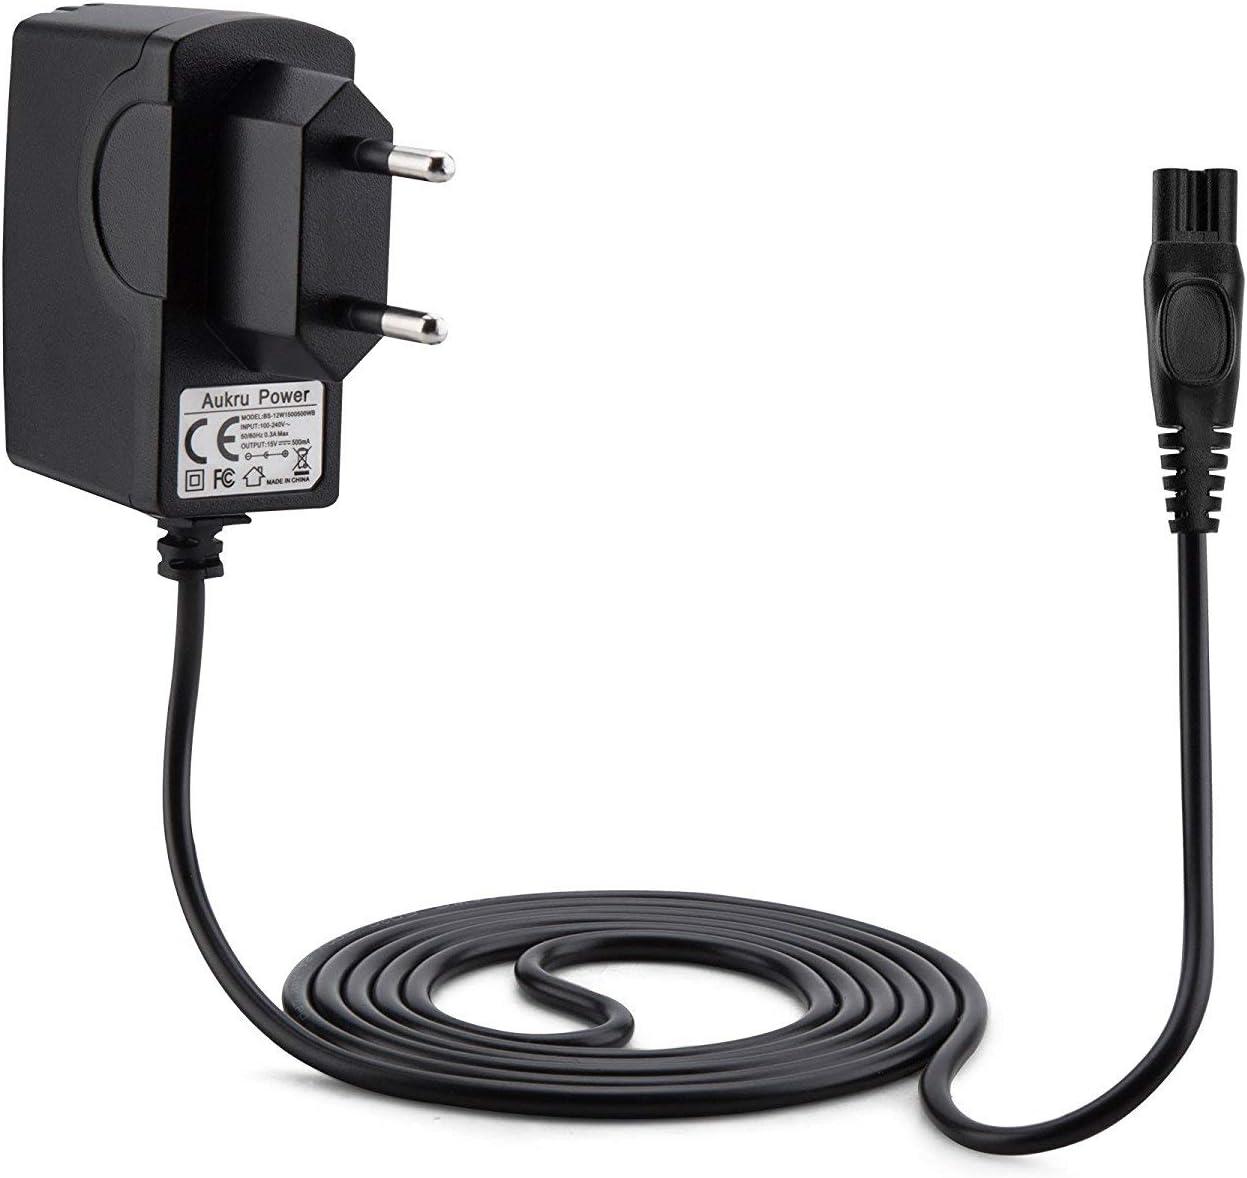 Aukru Cargador de Fuente de alimentación 15v para Philips afeitadora eléctrica RQ1050, RQ1060, RQ1051, RQ1075, RQ1085, RQ1095, RQ1090, 1050X, 1050CC, 1059X, 1060X, 1090X